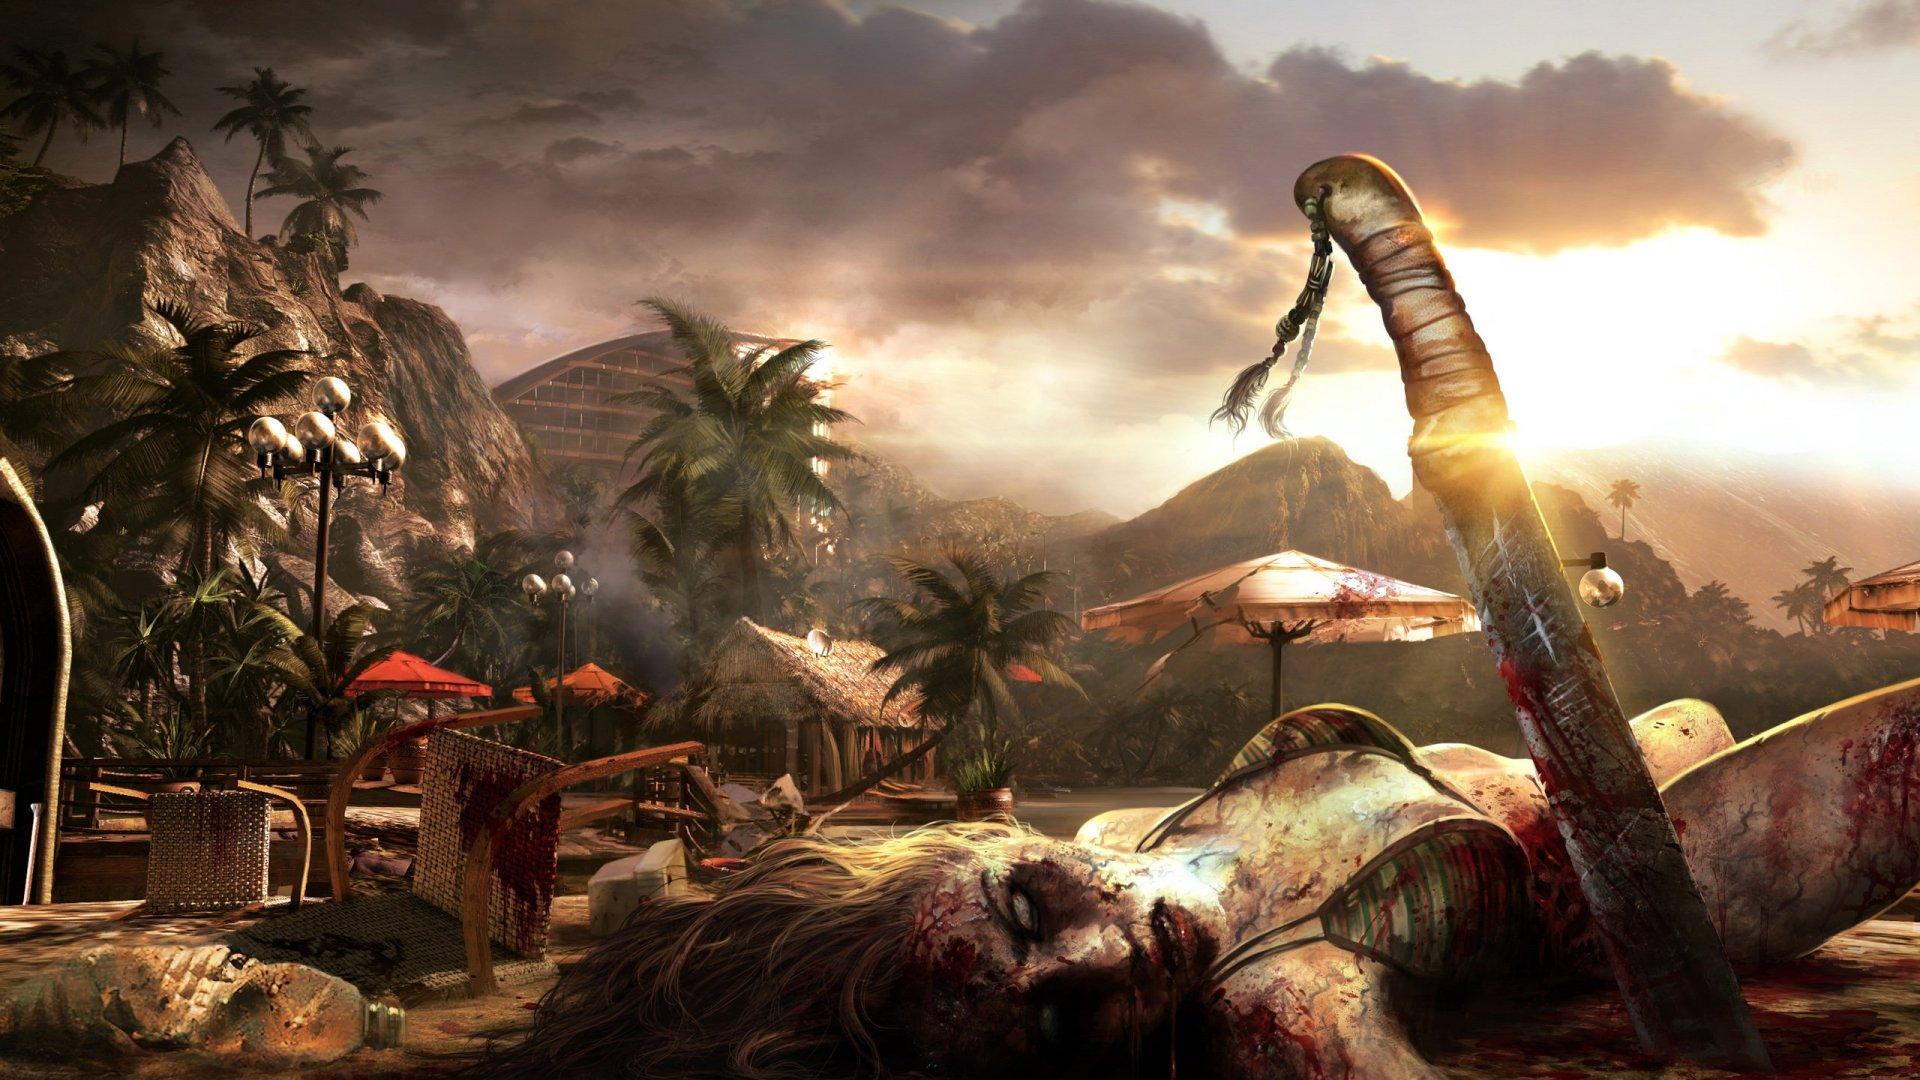 dead_island_action_dark_horror__60__1920x1080